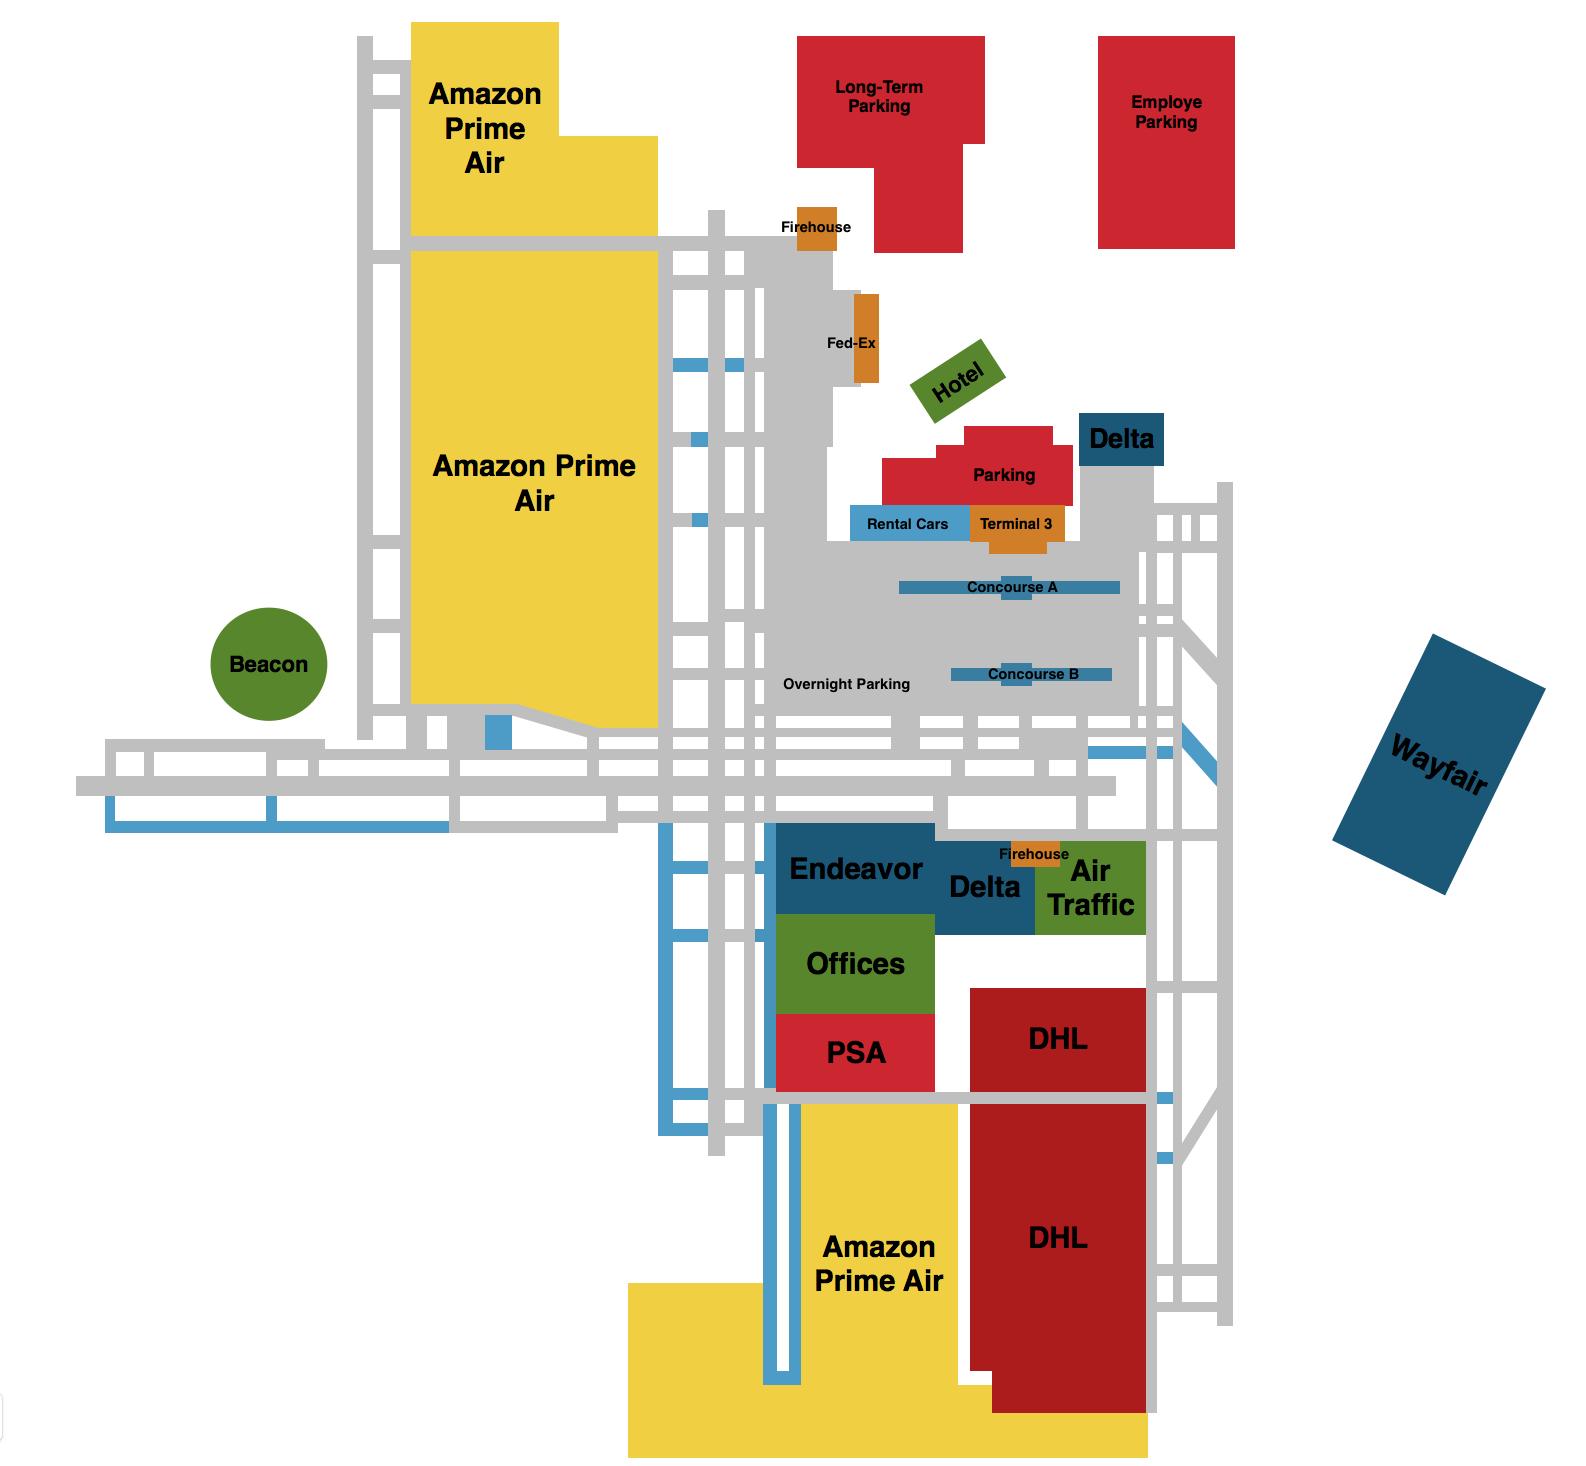 Budget Cvg Airport Car Rental